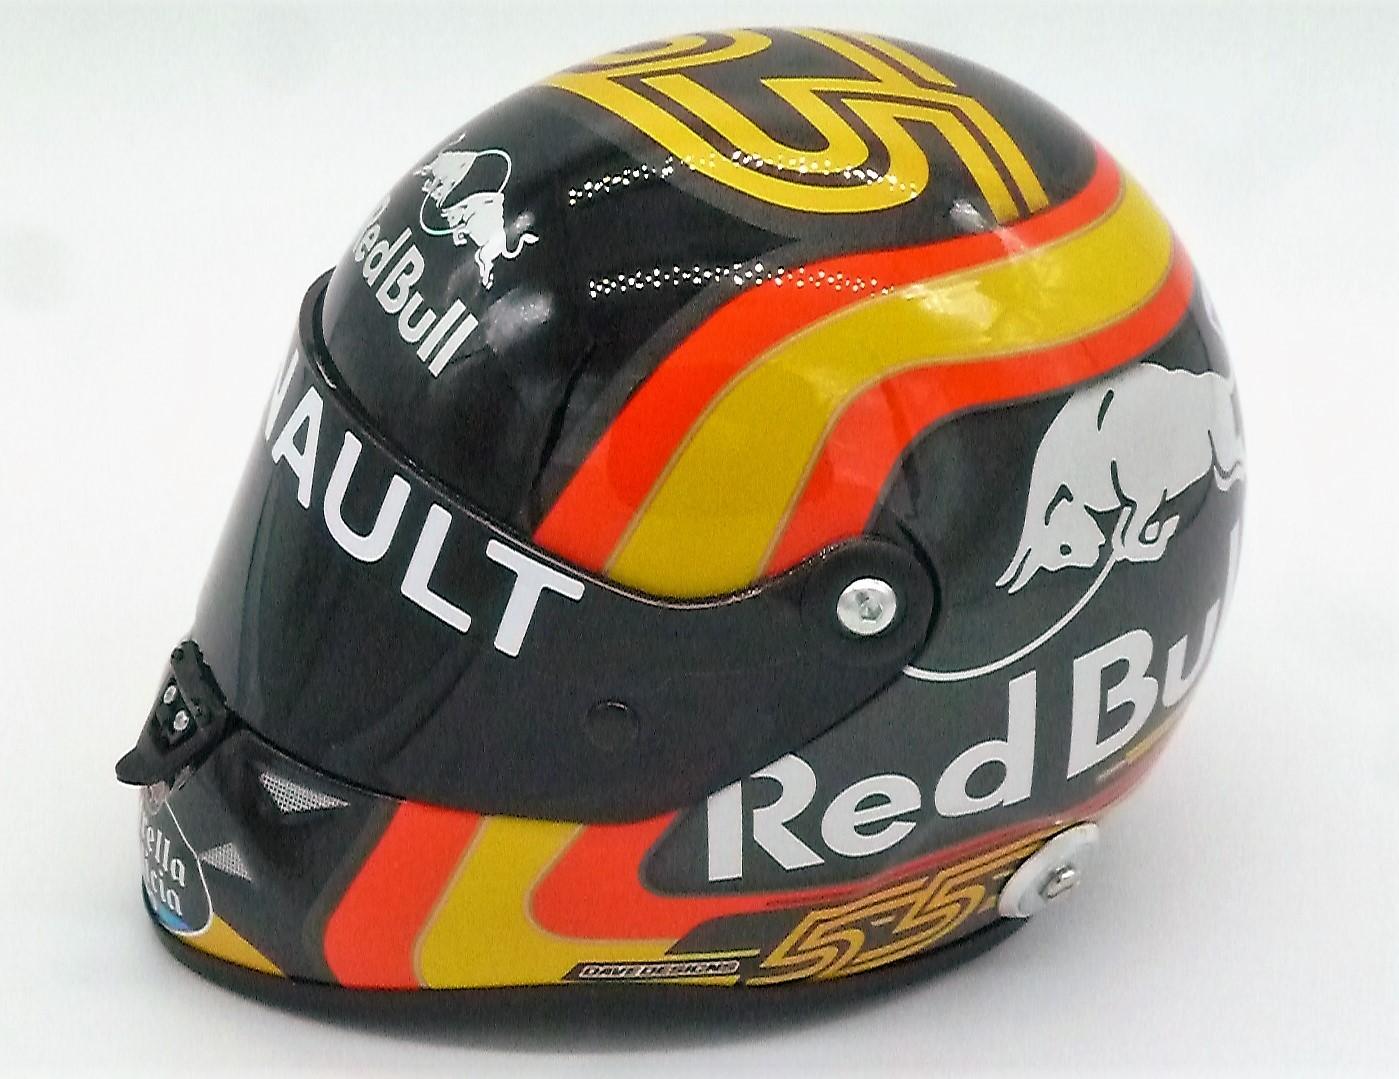 Carlos Sainz 2018 1:2 Scale Helmet